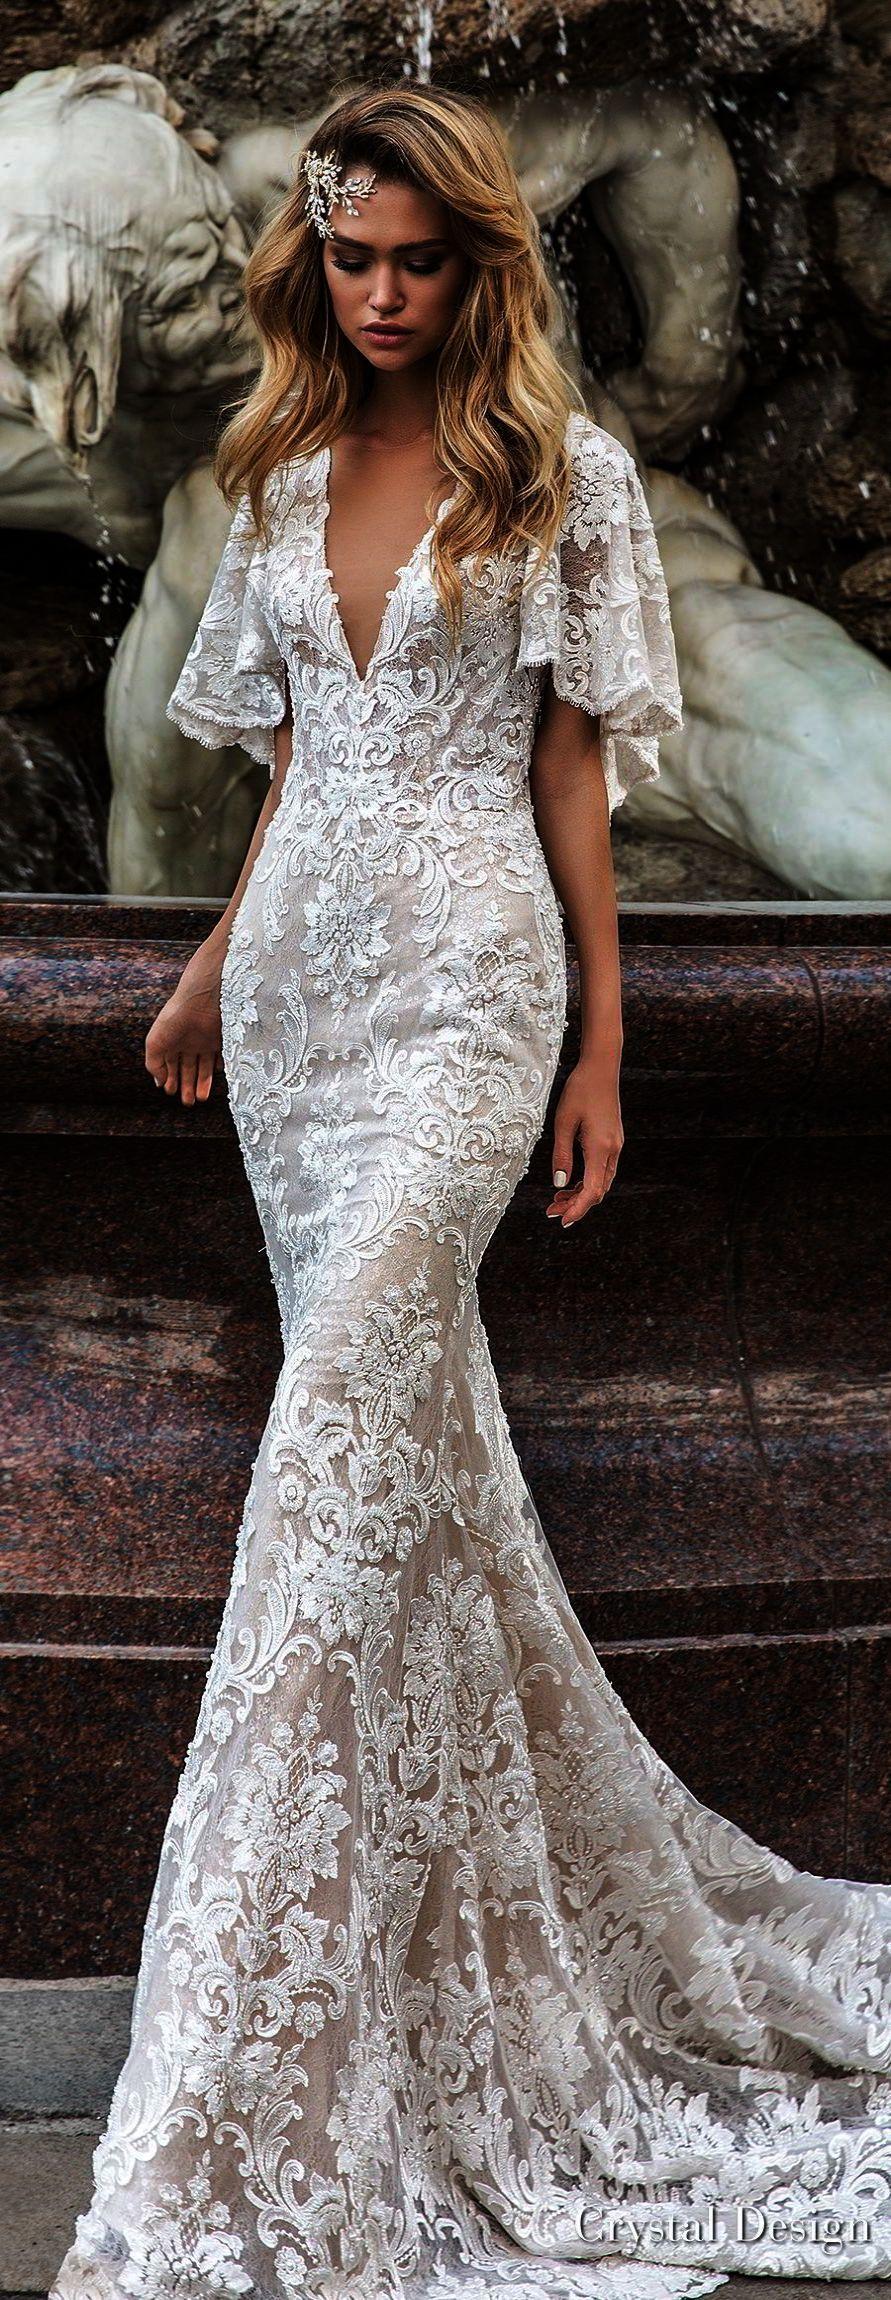 Lace Wedding Dresses Bristol Lace Wedding Dress Knitting Pattern Fit And Flare Wedding Dress Trendy Wedding Dresses Fitted Wedding Dress